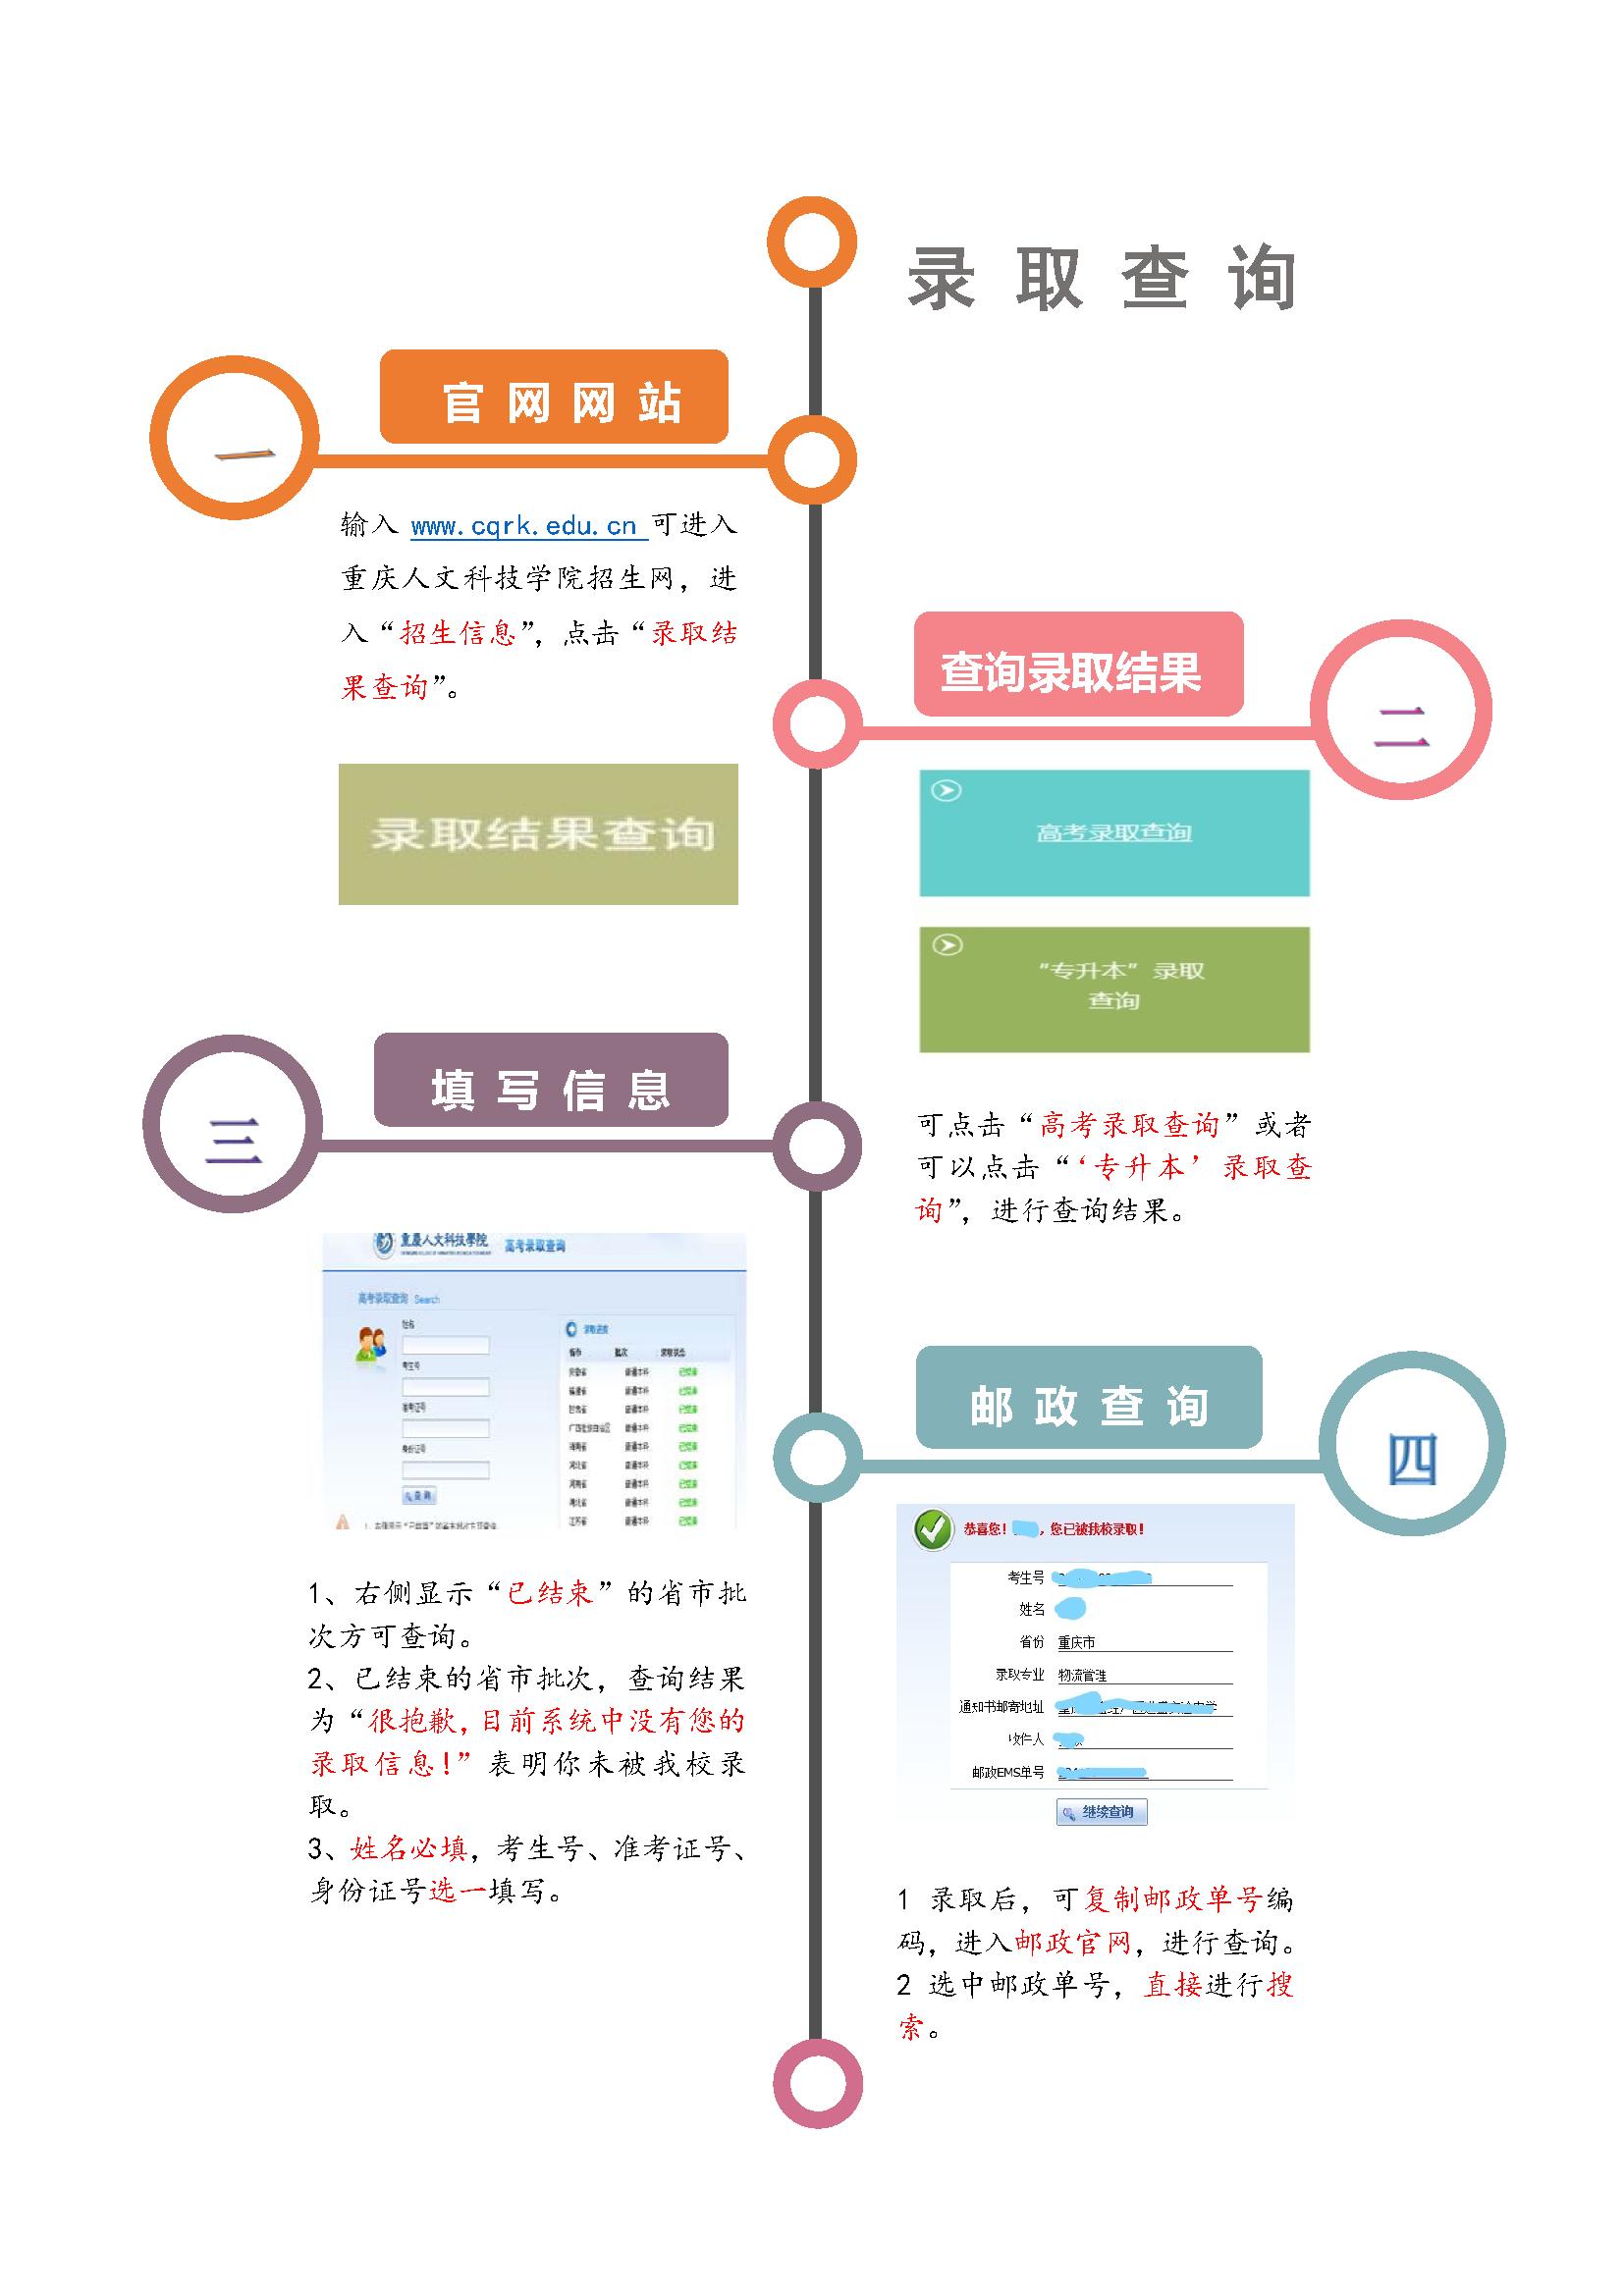 录取查询流程图.png